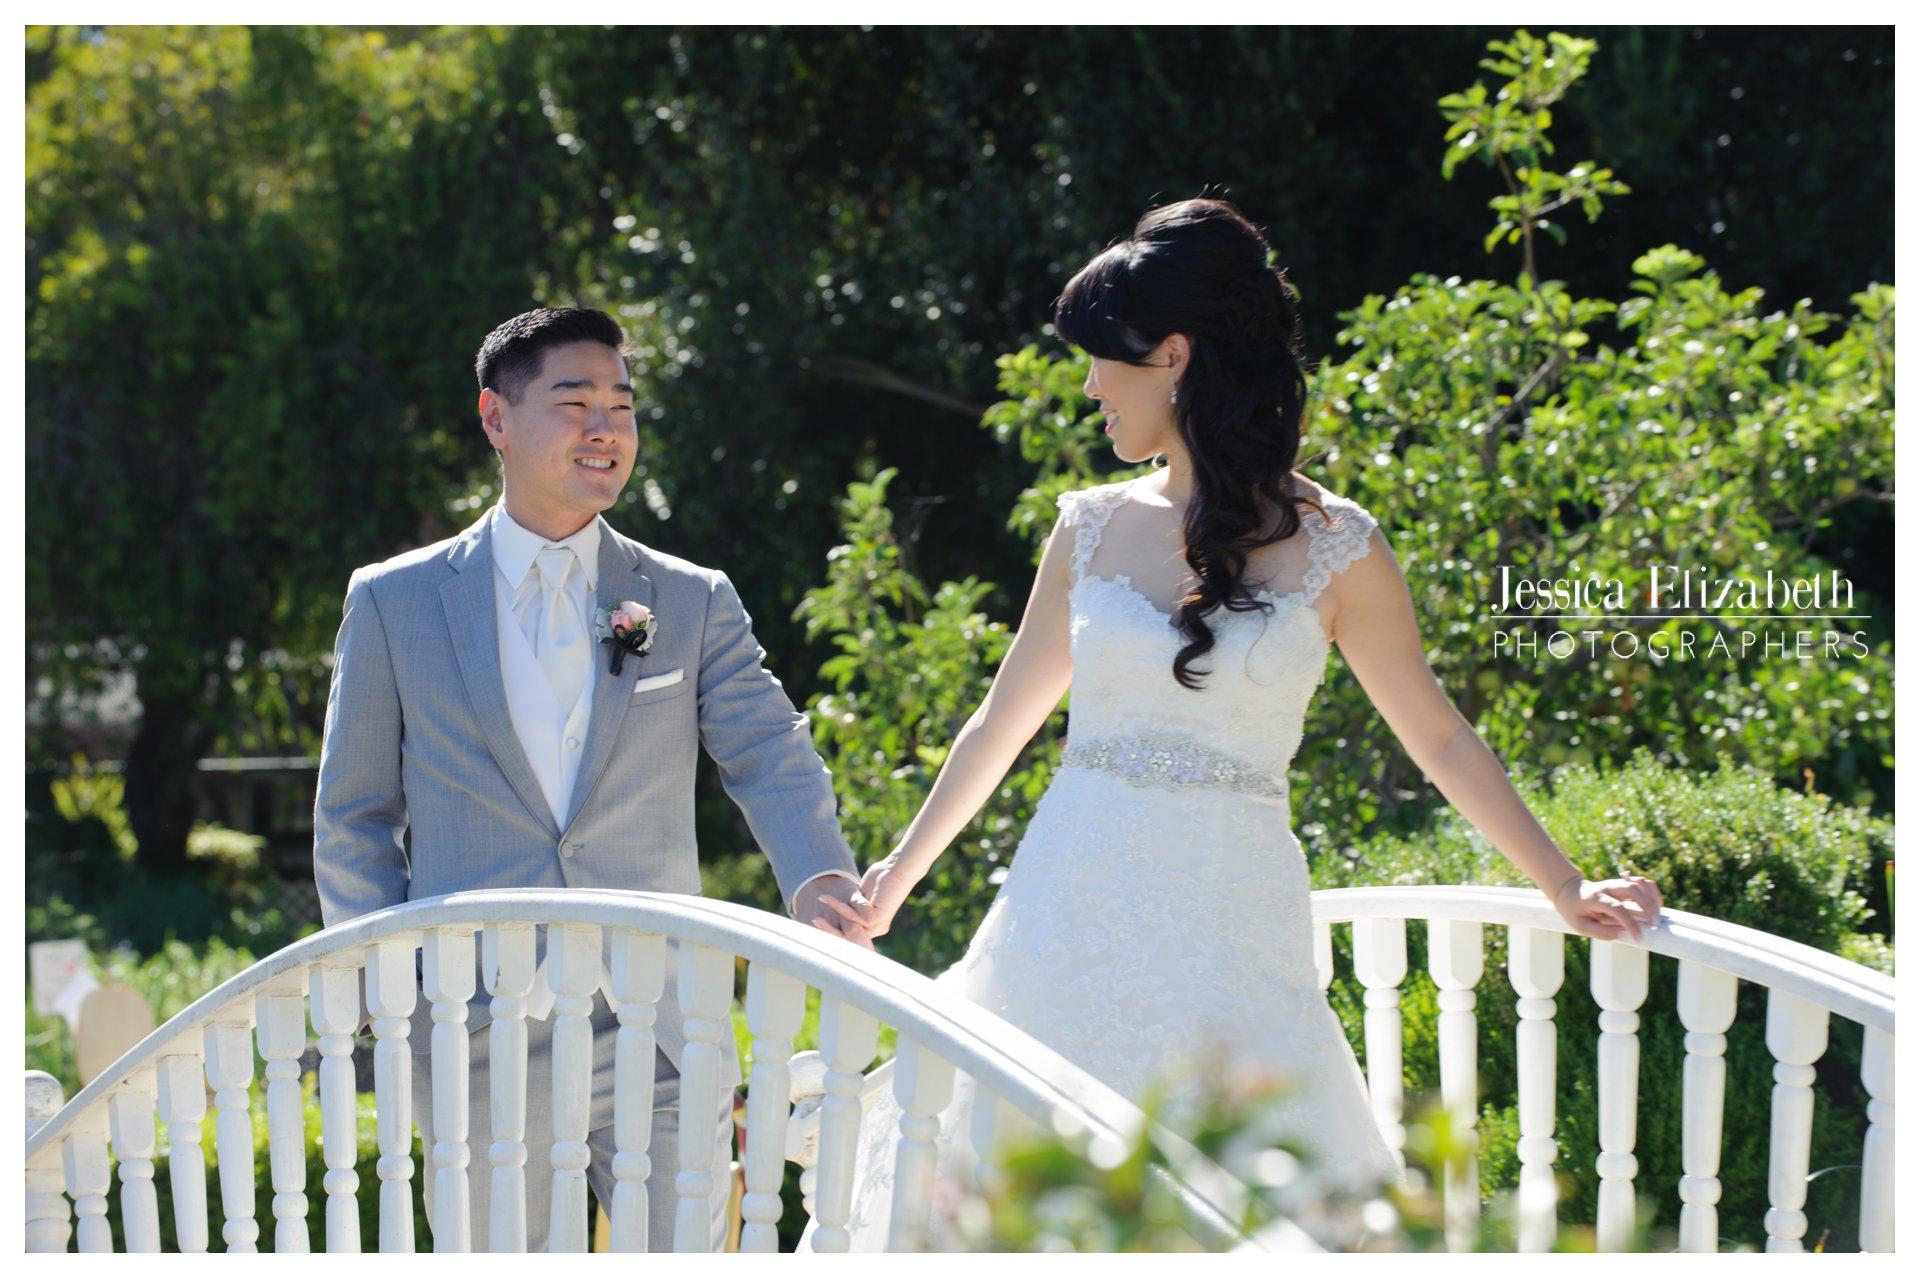 13-South-Coast-Botanic-Garden-Palos-Verdes-Wedding-Photography-by-Jessica-Elizabeth.jpg